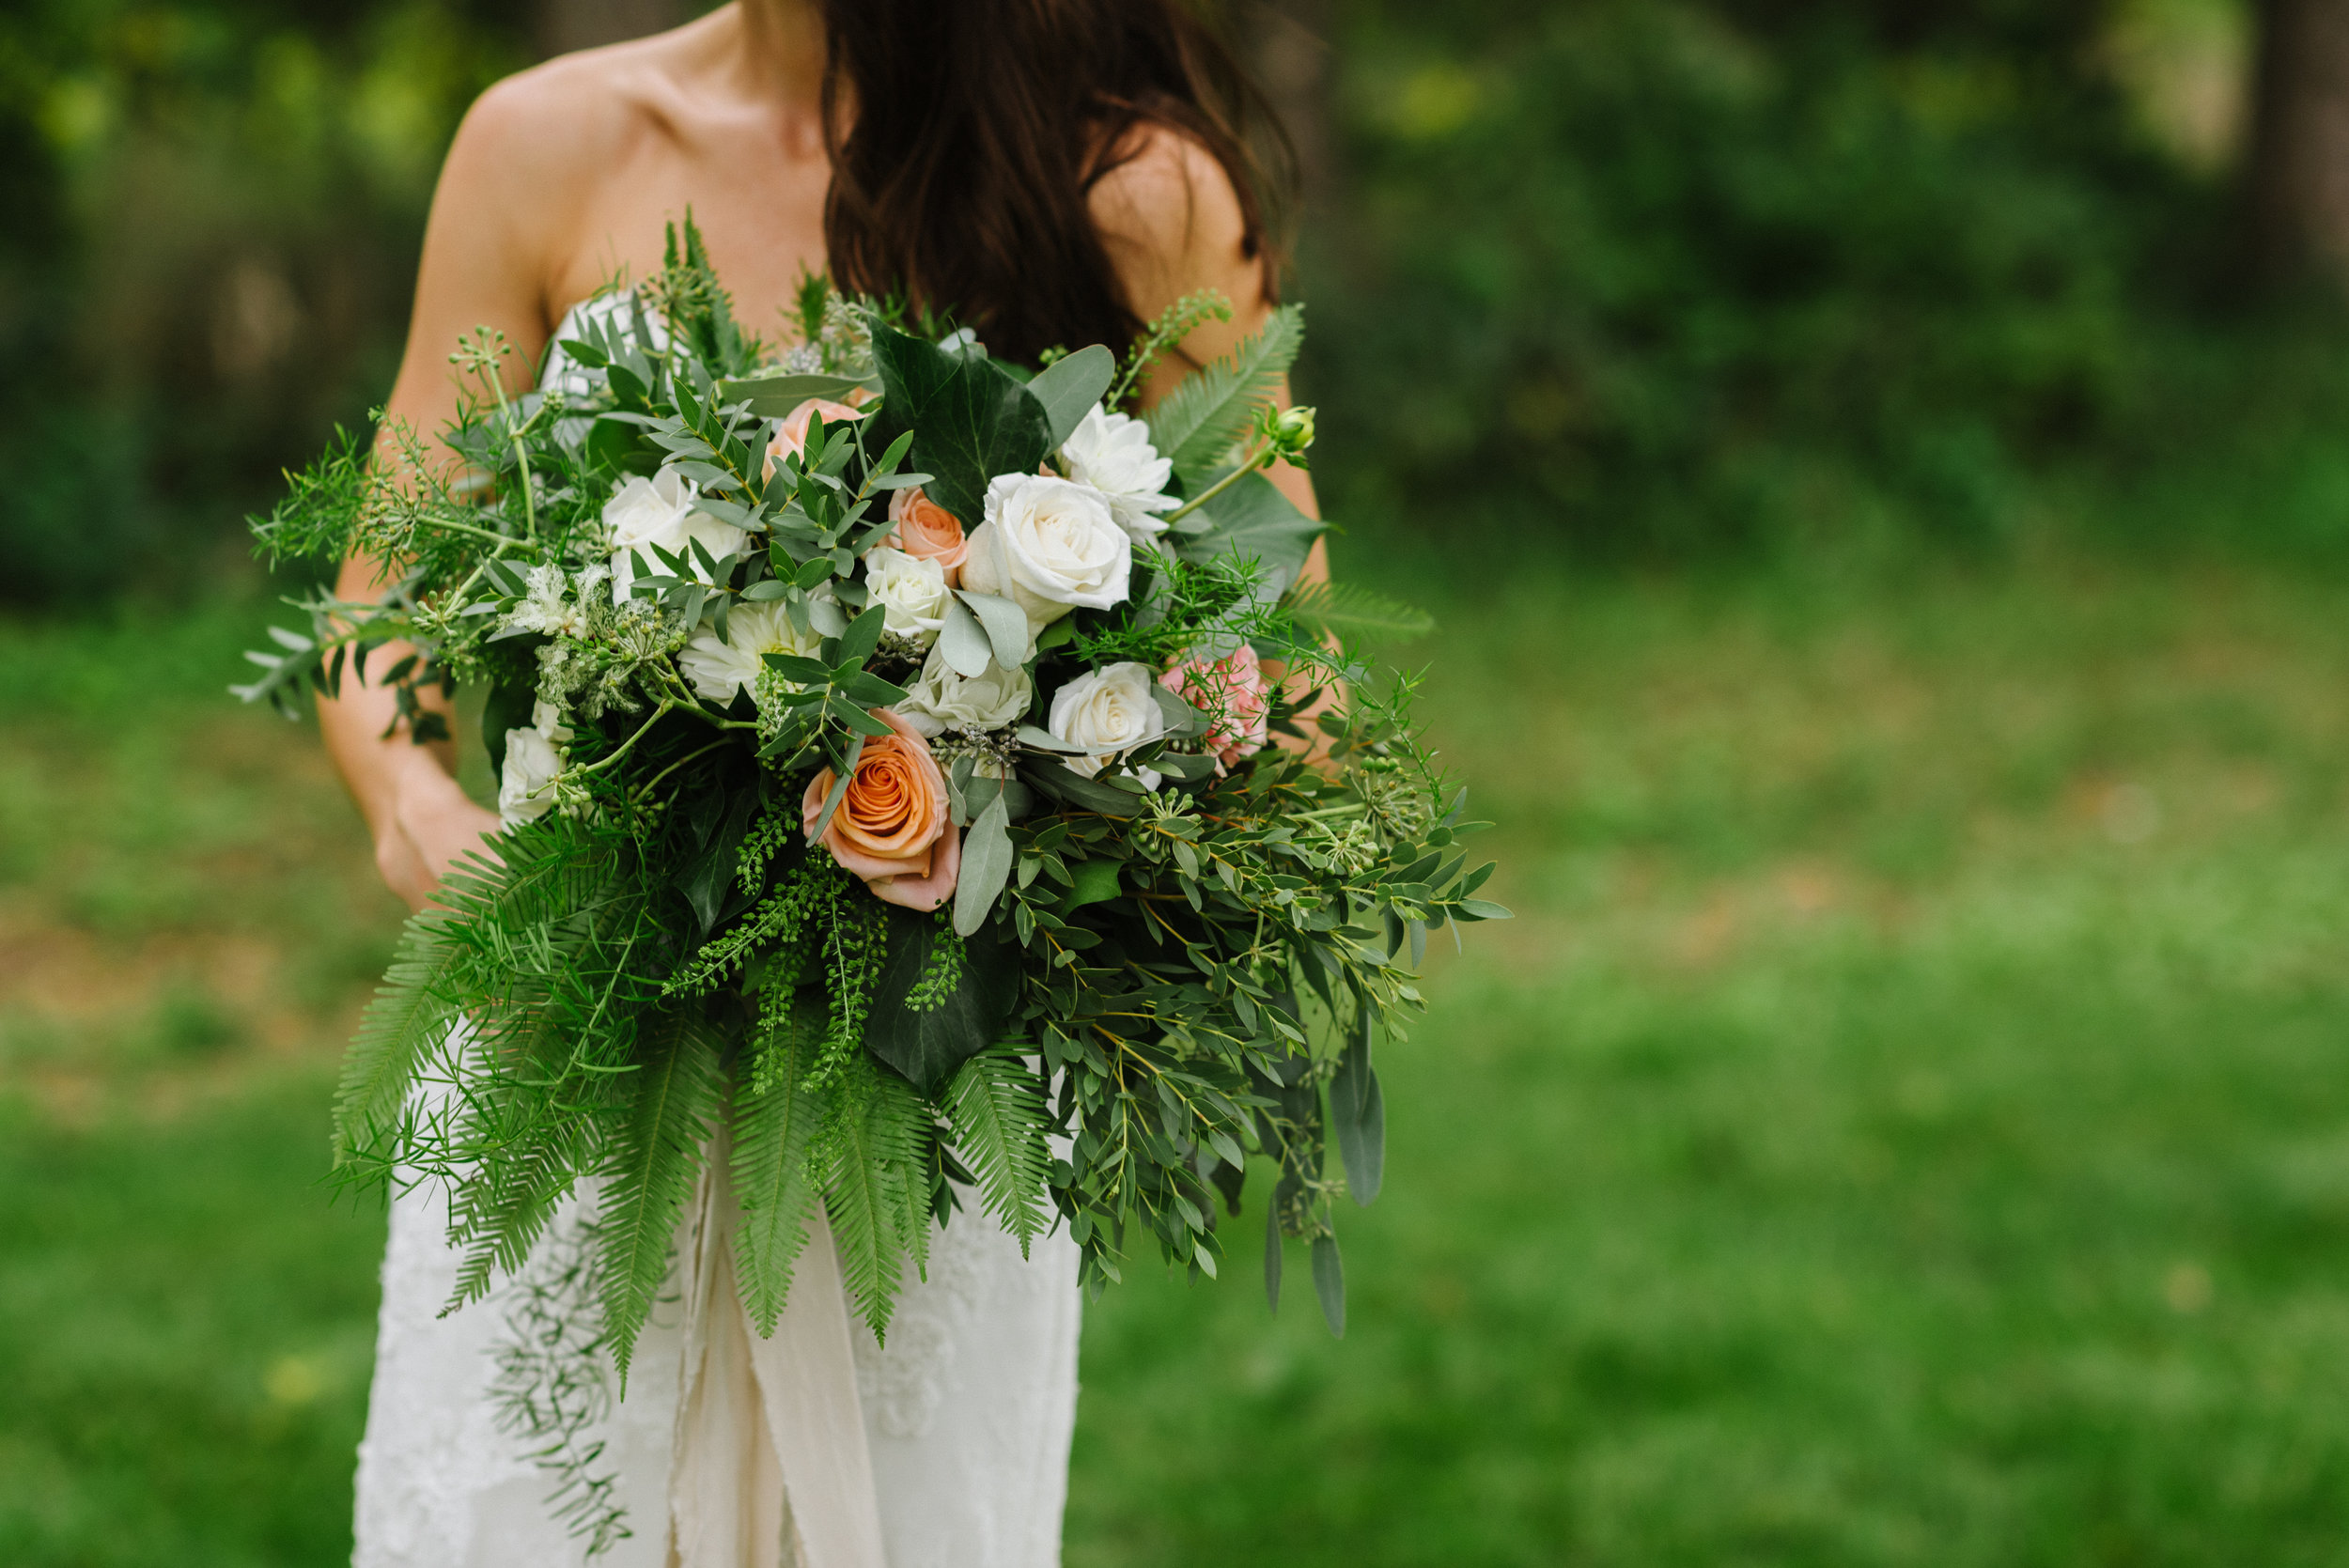 bride-bouquet-greenery-ribbon